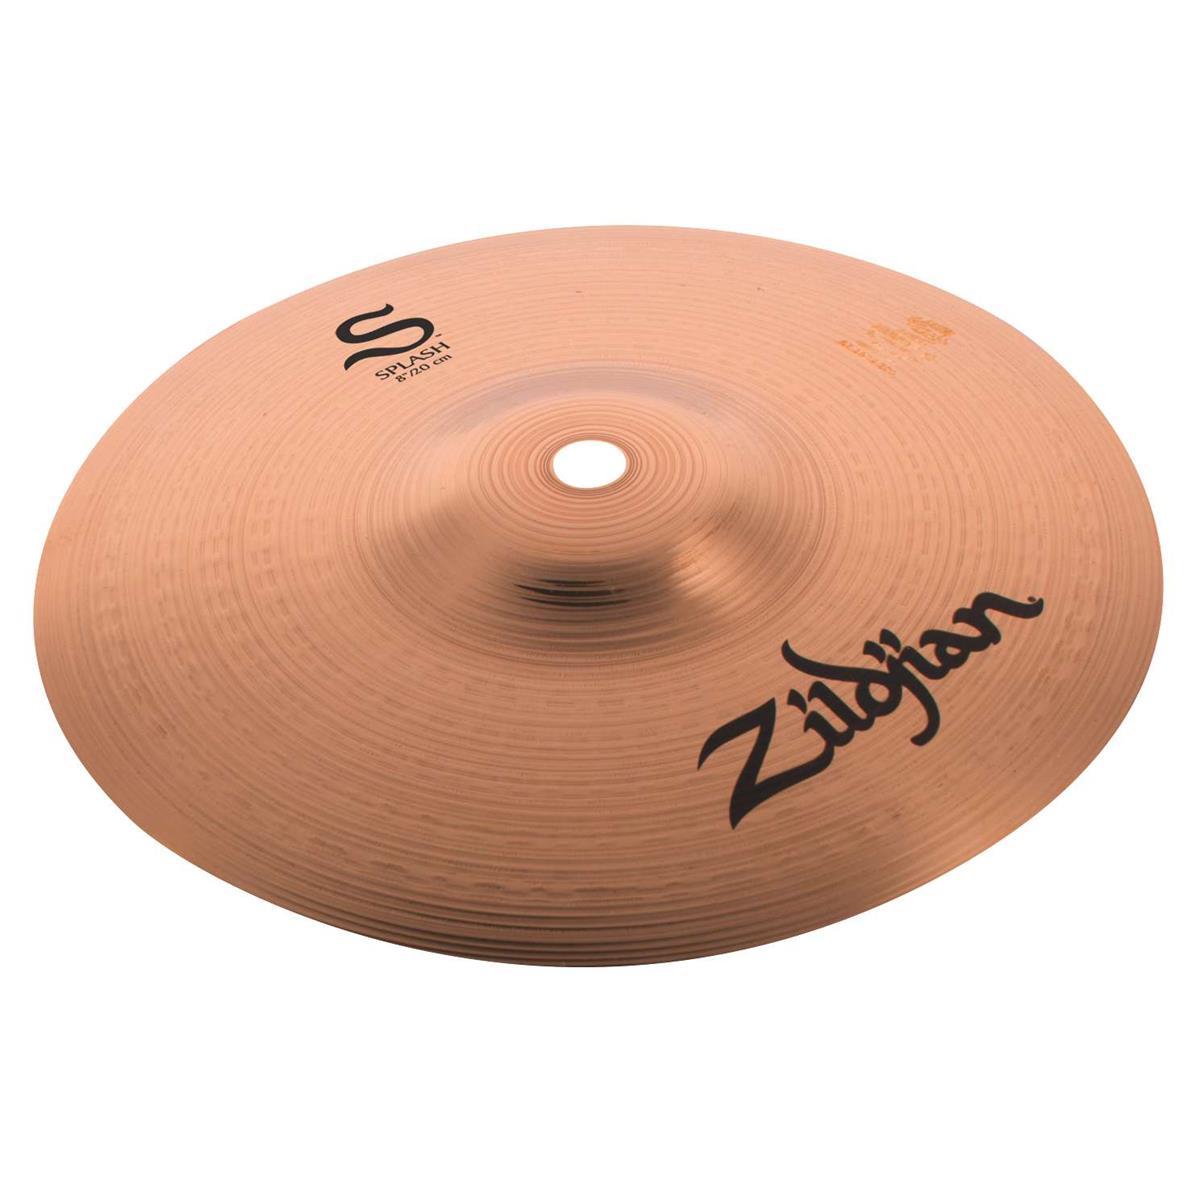 Zildjian-8-S-Splash-cm-20-sku-9022056218001